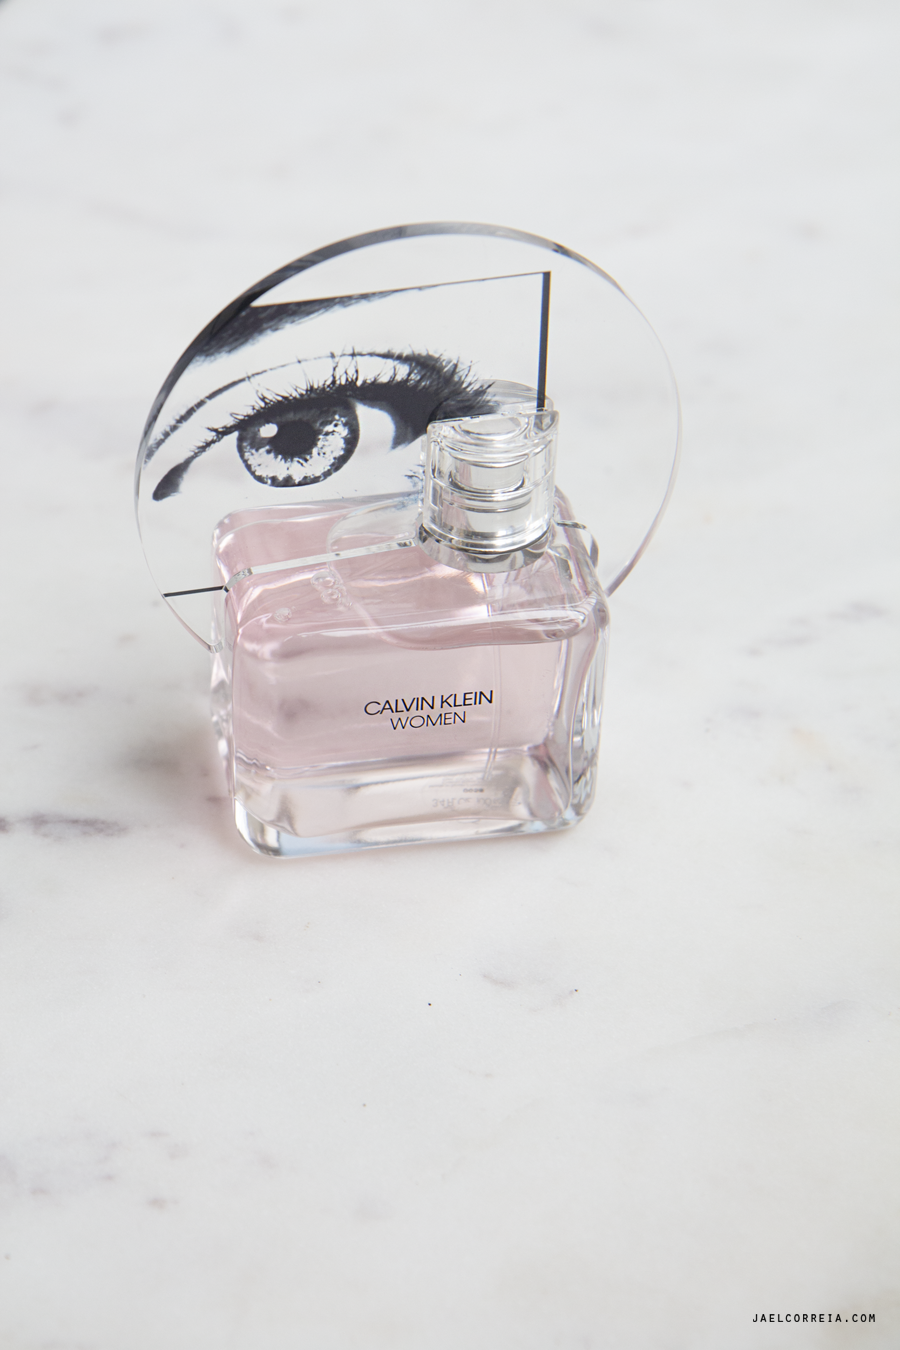 CK women Calvin Klein women eau de parfum perfume review jael correia portugal notino perfumes baratos originais femininos pt online shop